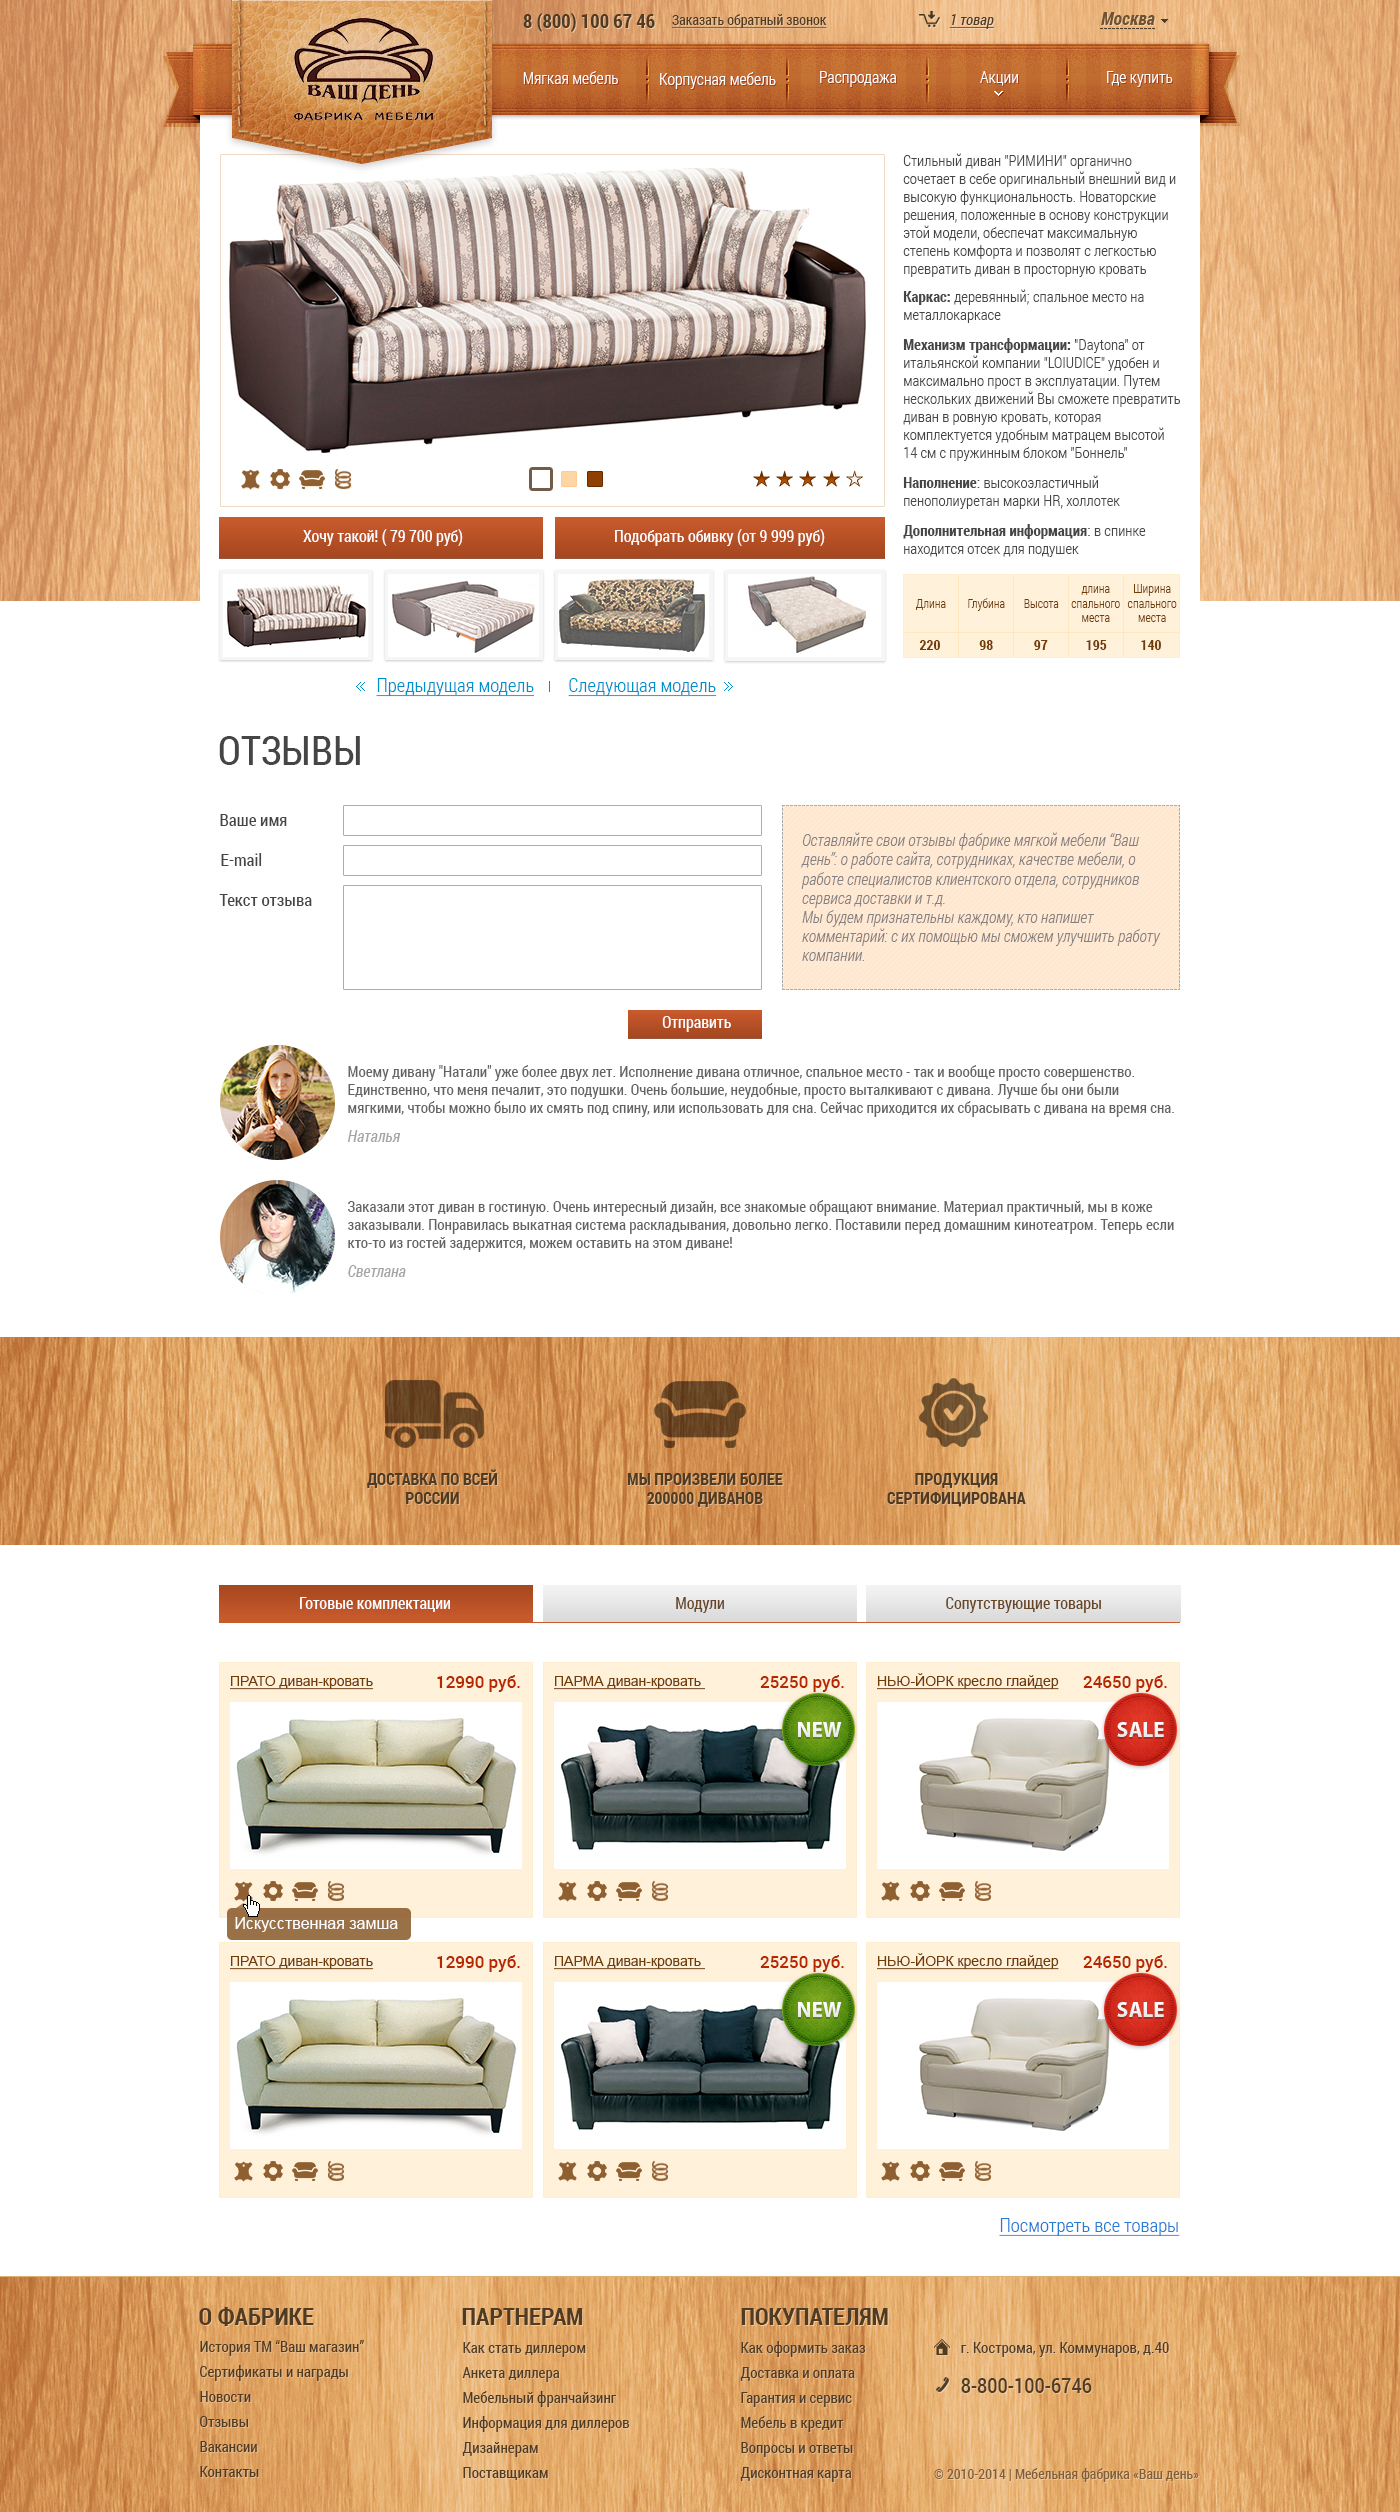 Разработать дизайн для интернет-магазина мебели фото f_71752f25a416f469.jpg